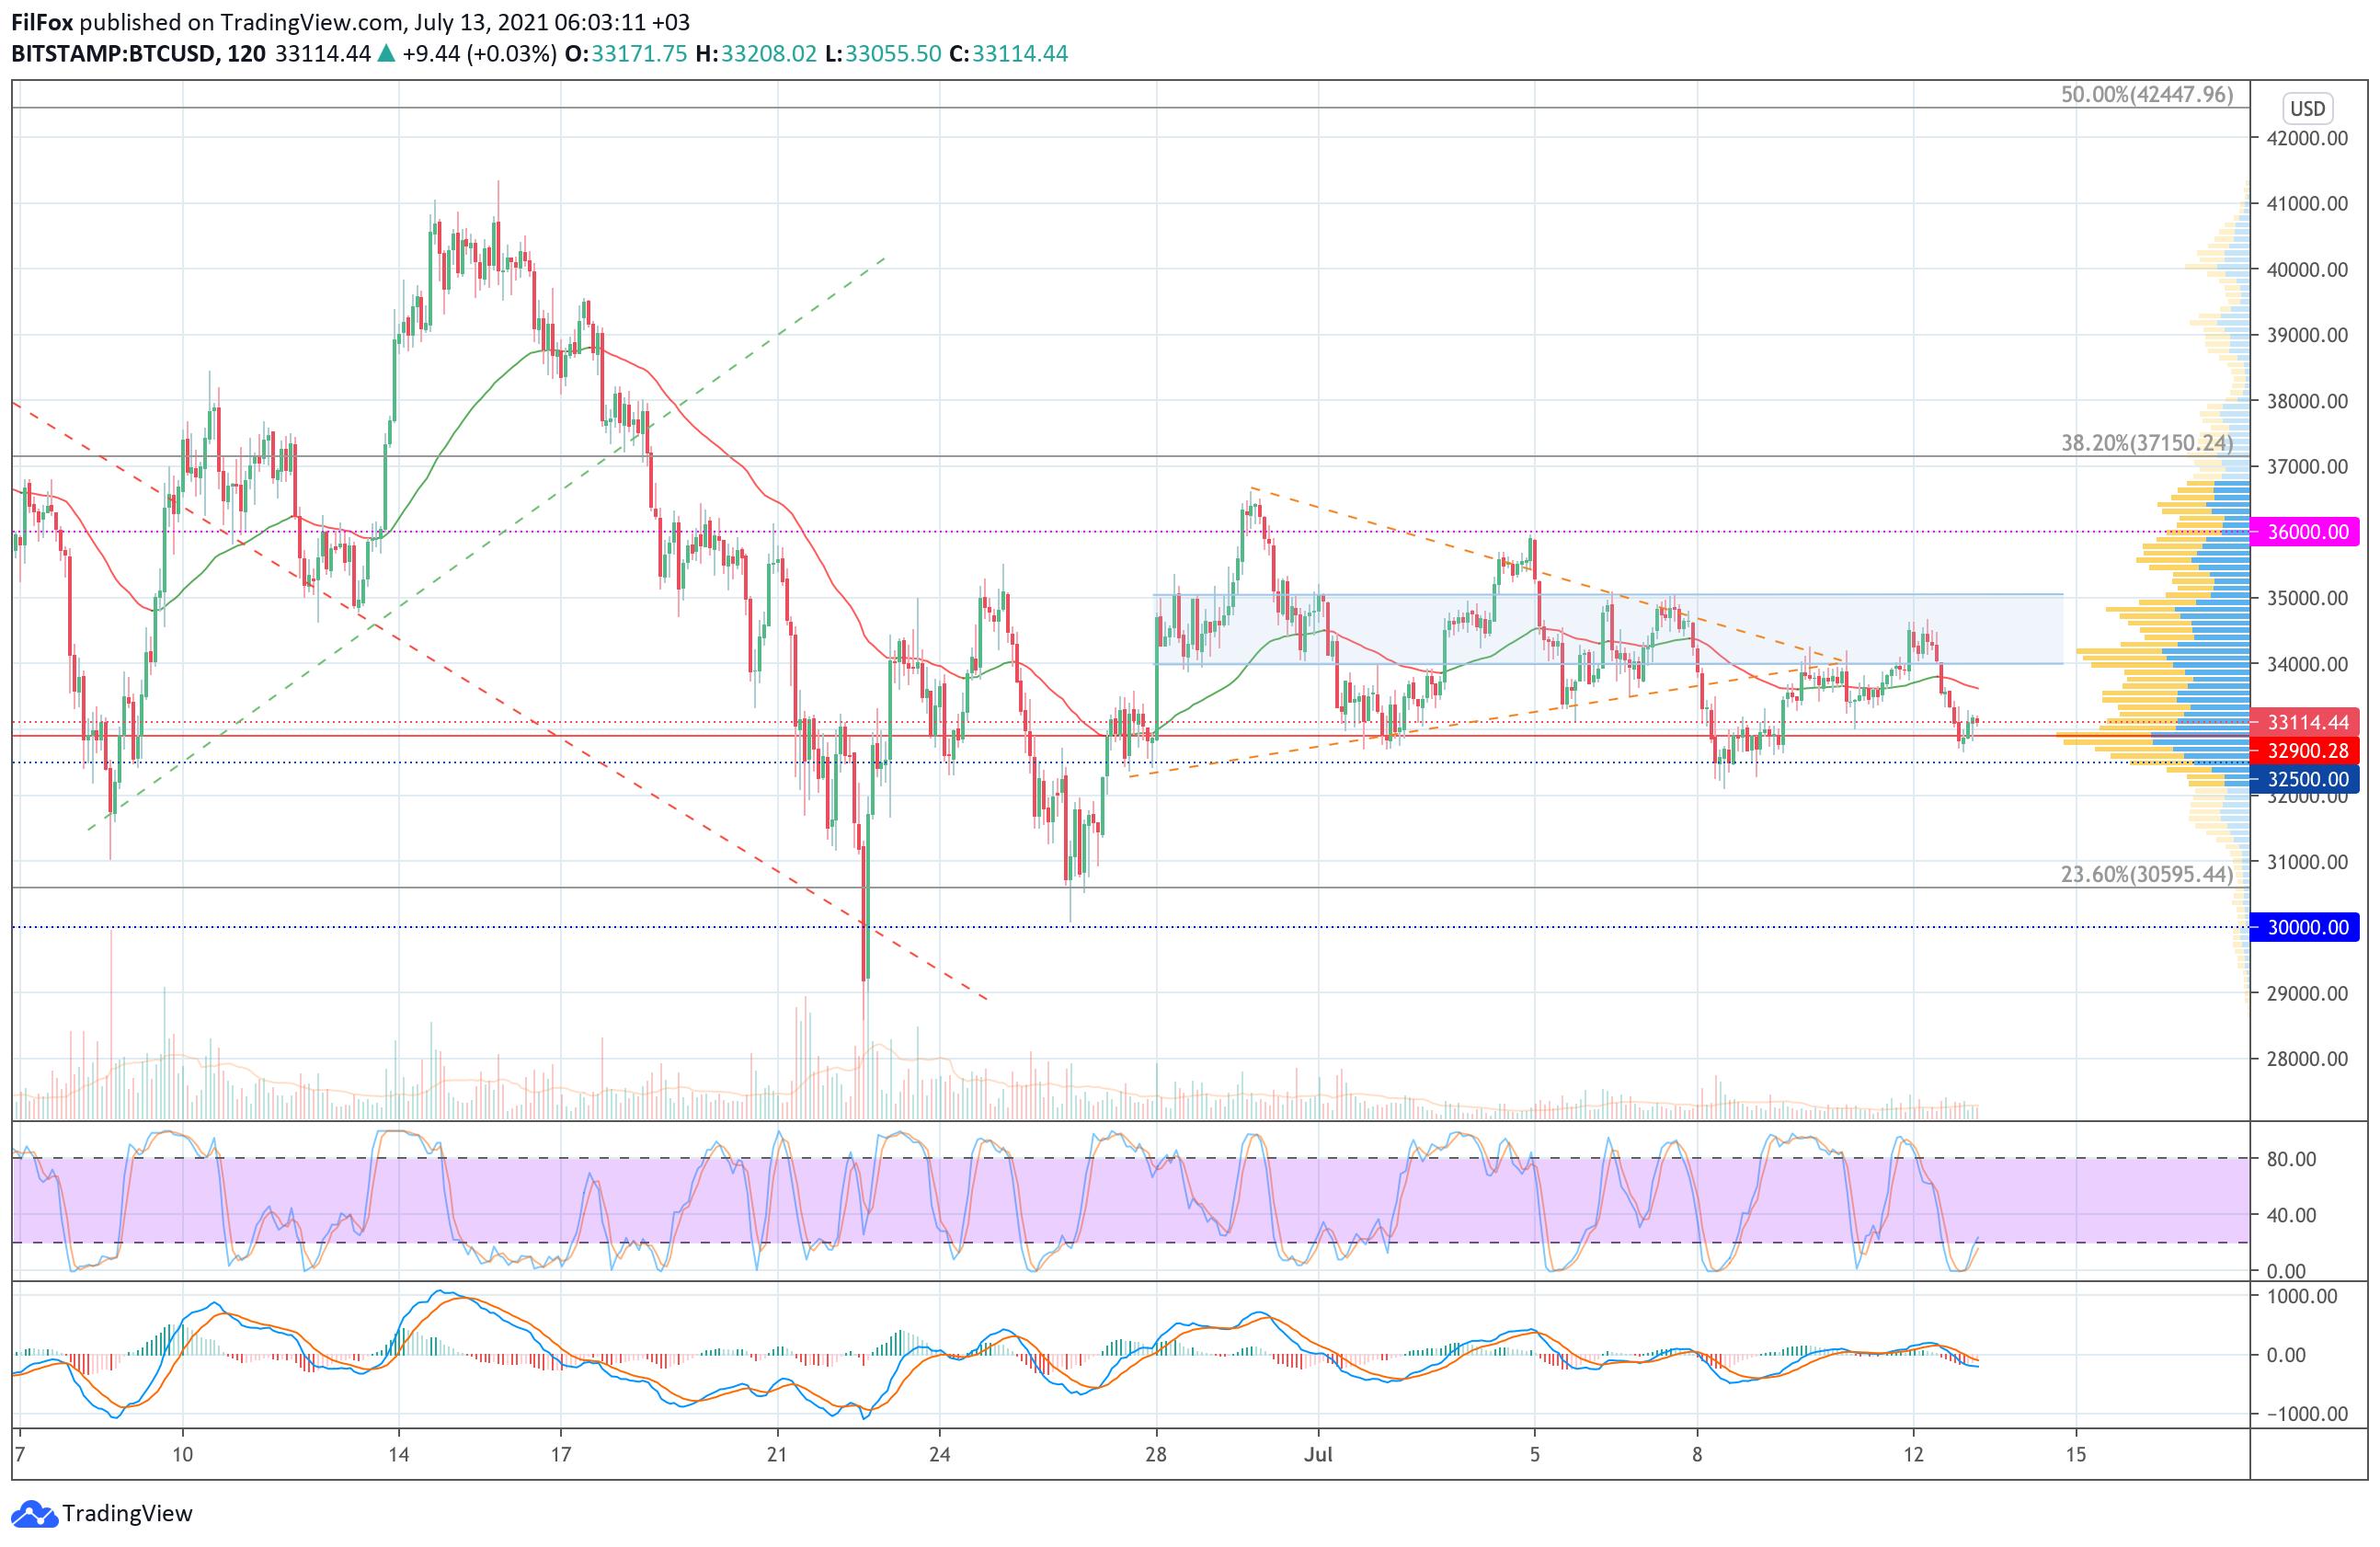 Анализ цен Bitcoin, Ethereum, XRP на 13.07.2021